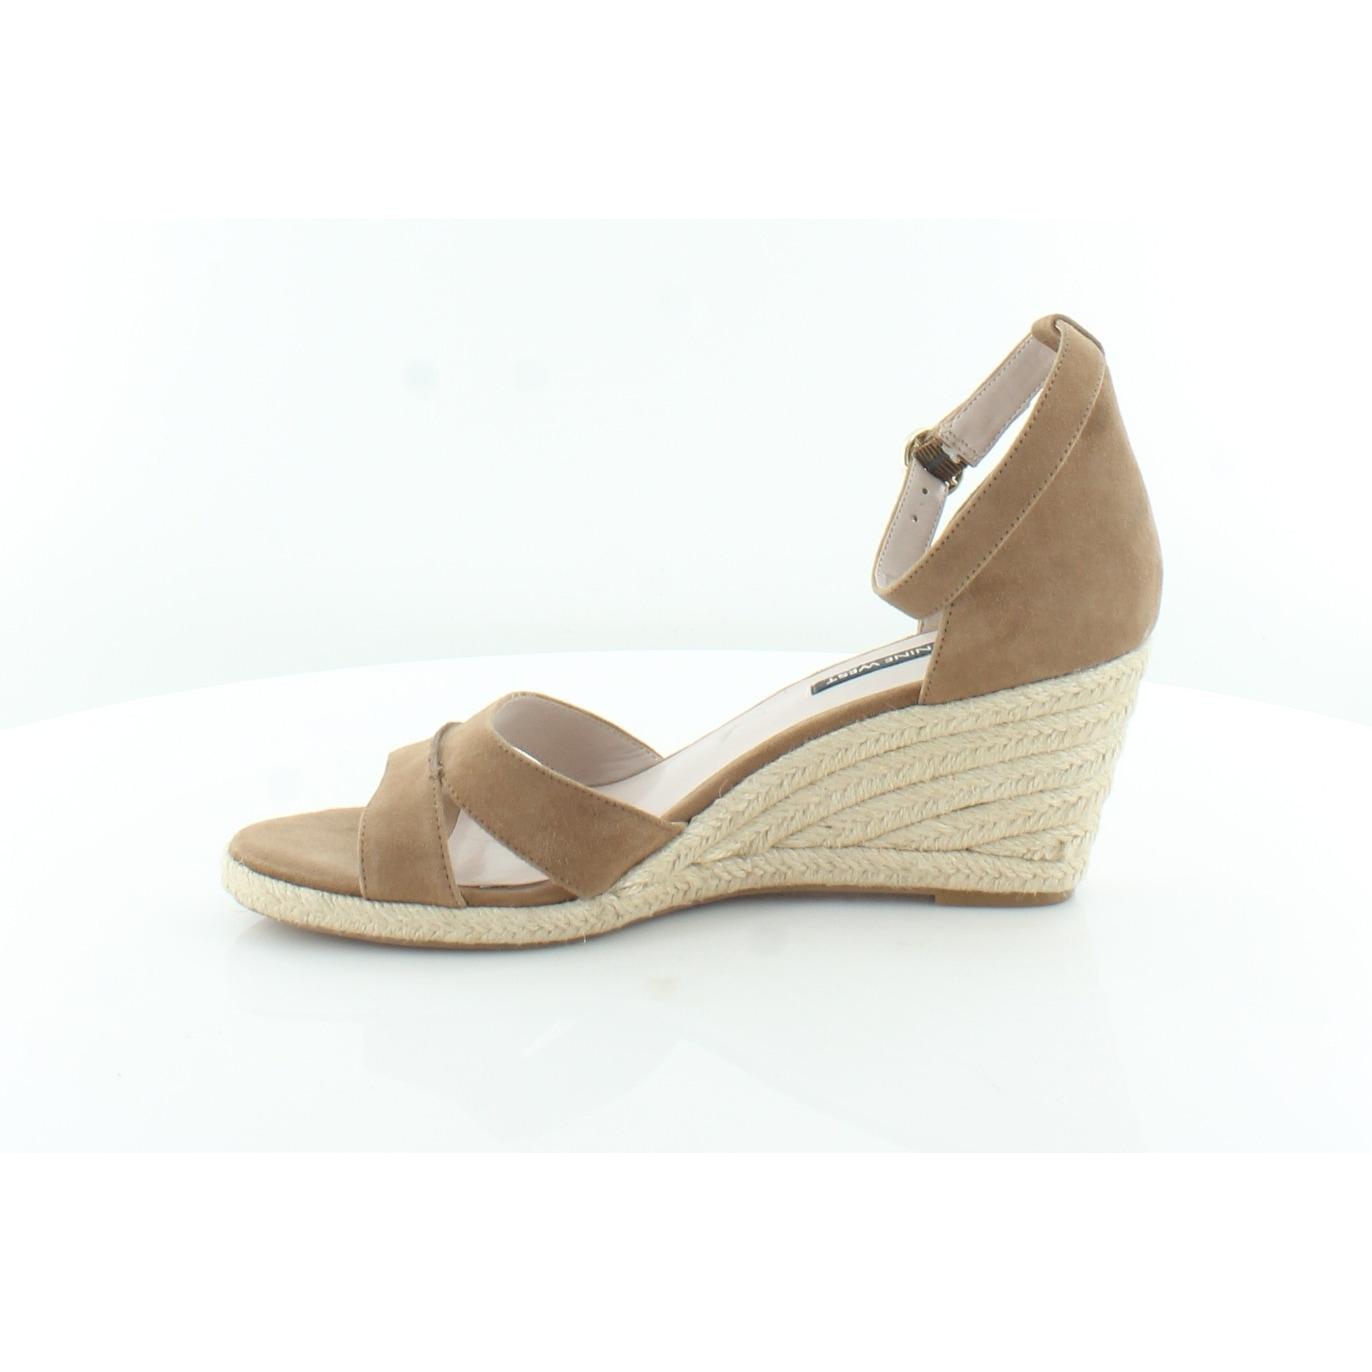 5bdf6bca00 Shop Nine West Jeranna Women's Sandals Dark Natural - 9.5 - Free Shipping  Today - Overstock - 27111261